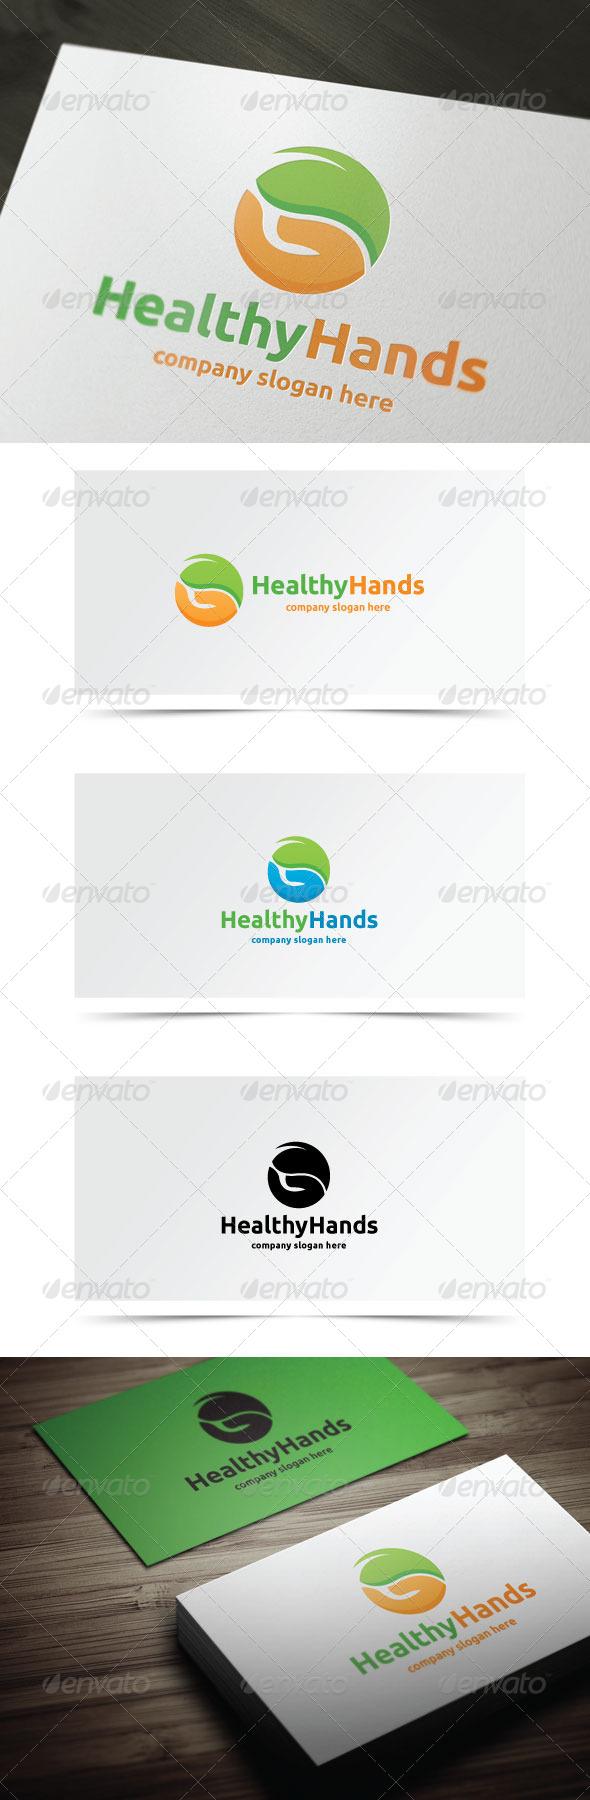 GraphicRiver Healthy Hands 7841887